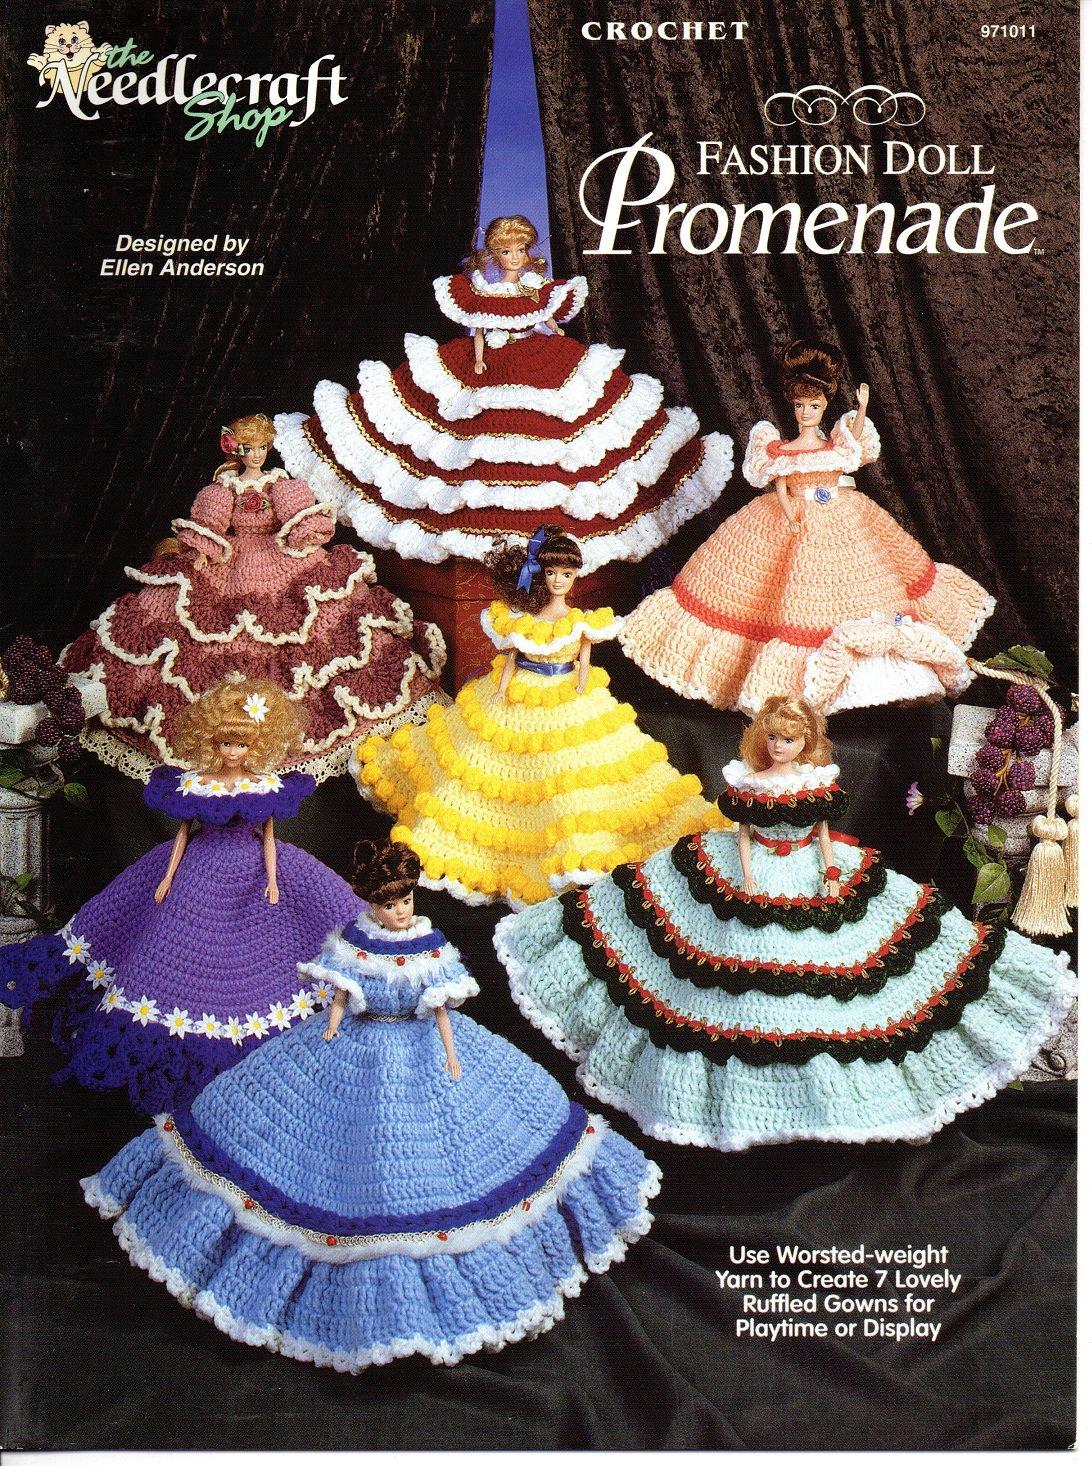 Crochet Fashion Doll Promenade Patterns - The Needlecraft Shop 971011